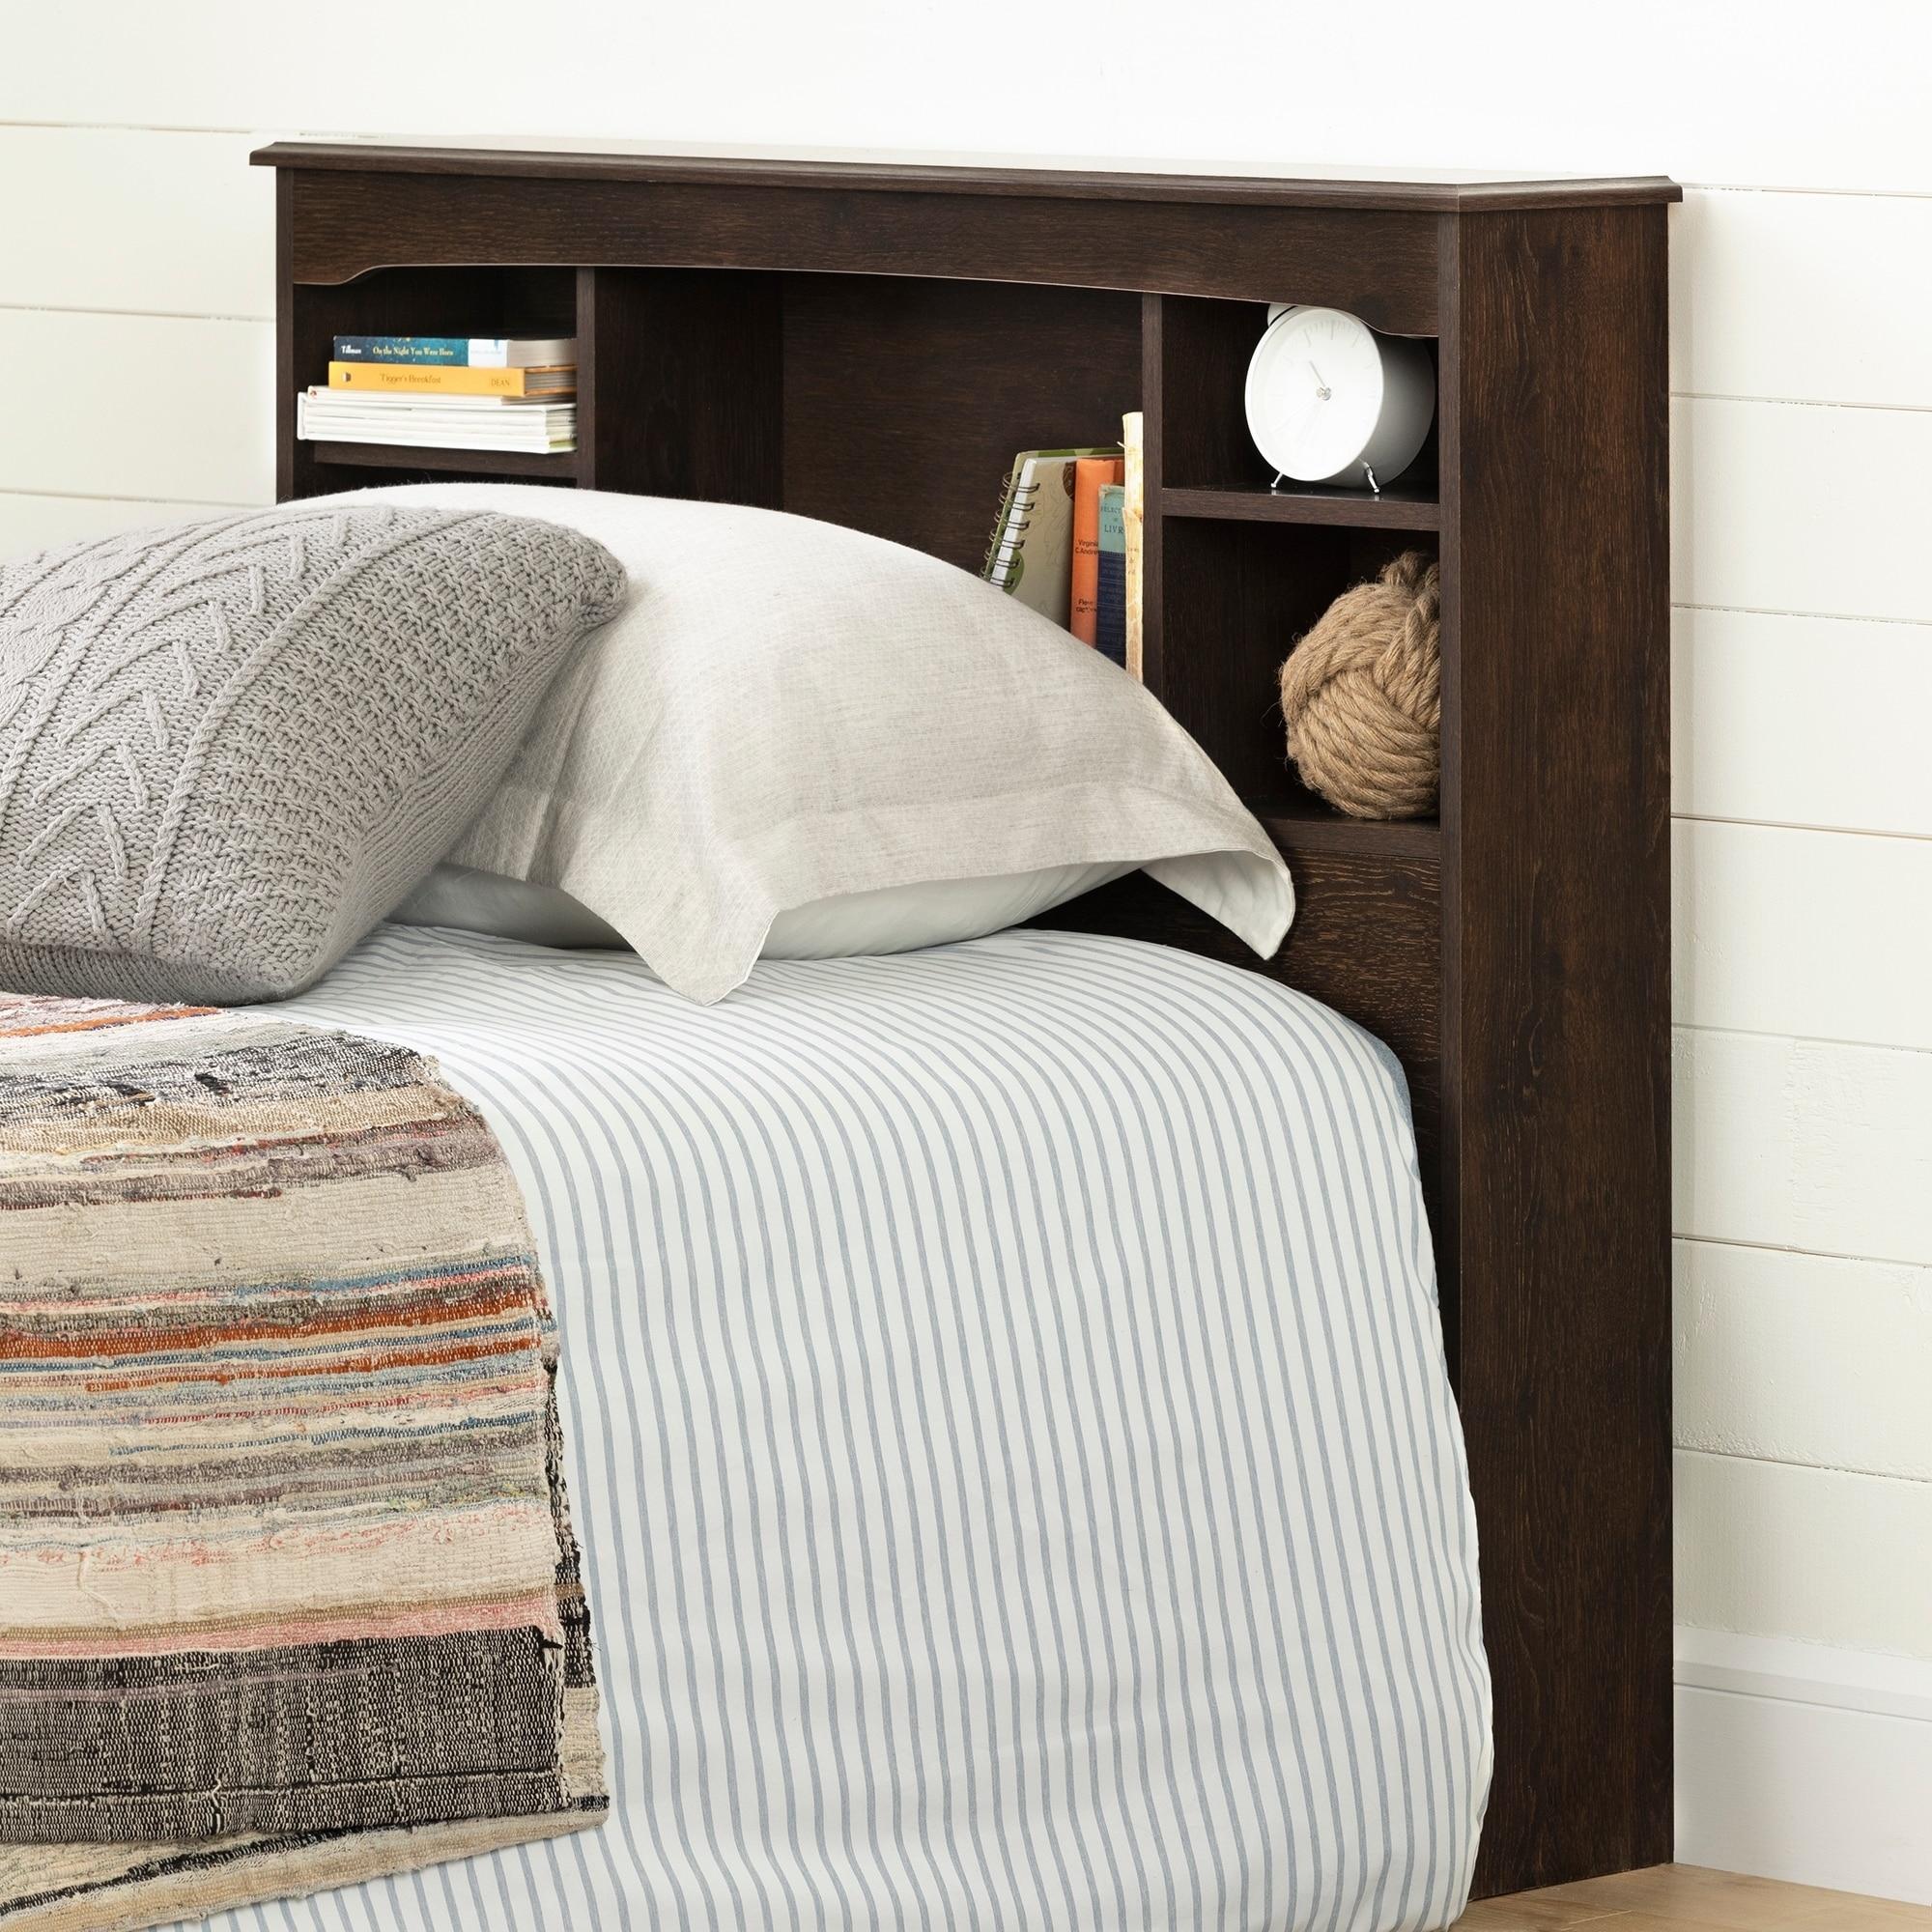 South Shore Aviron Twin Bookcase Headboard (39)  Free Shipping